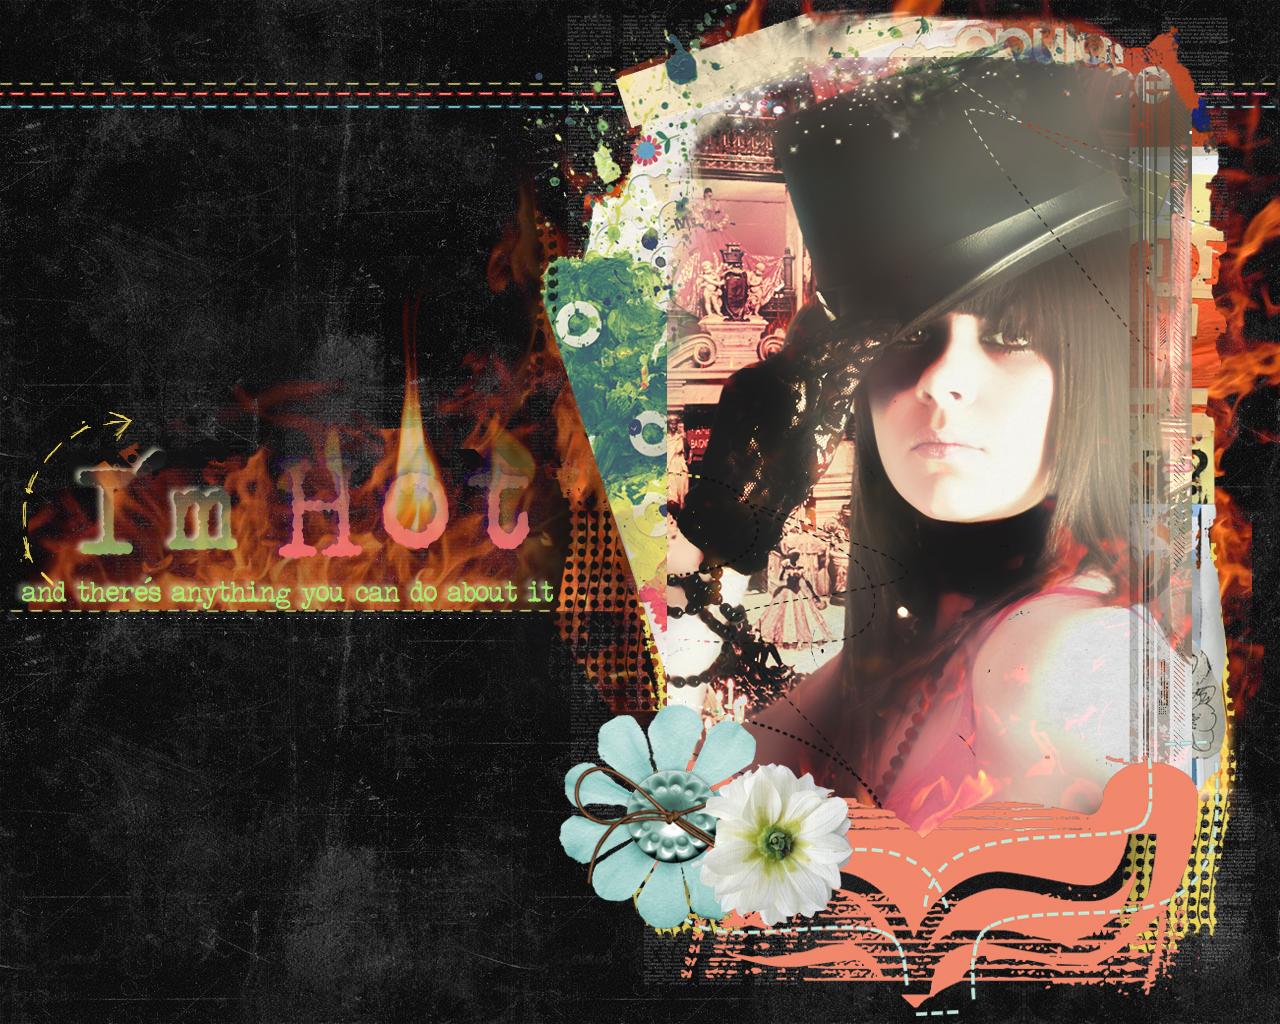 Hot wallpaper by lucky lola on deviantart for Lucky lola